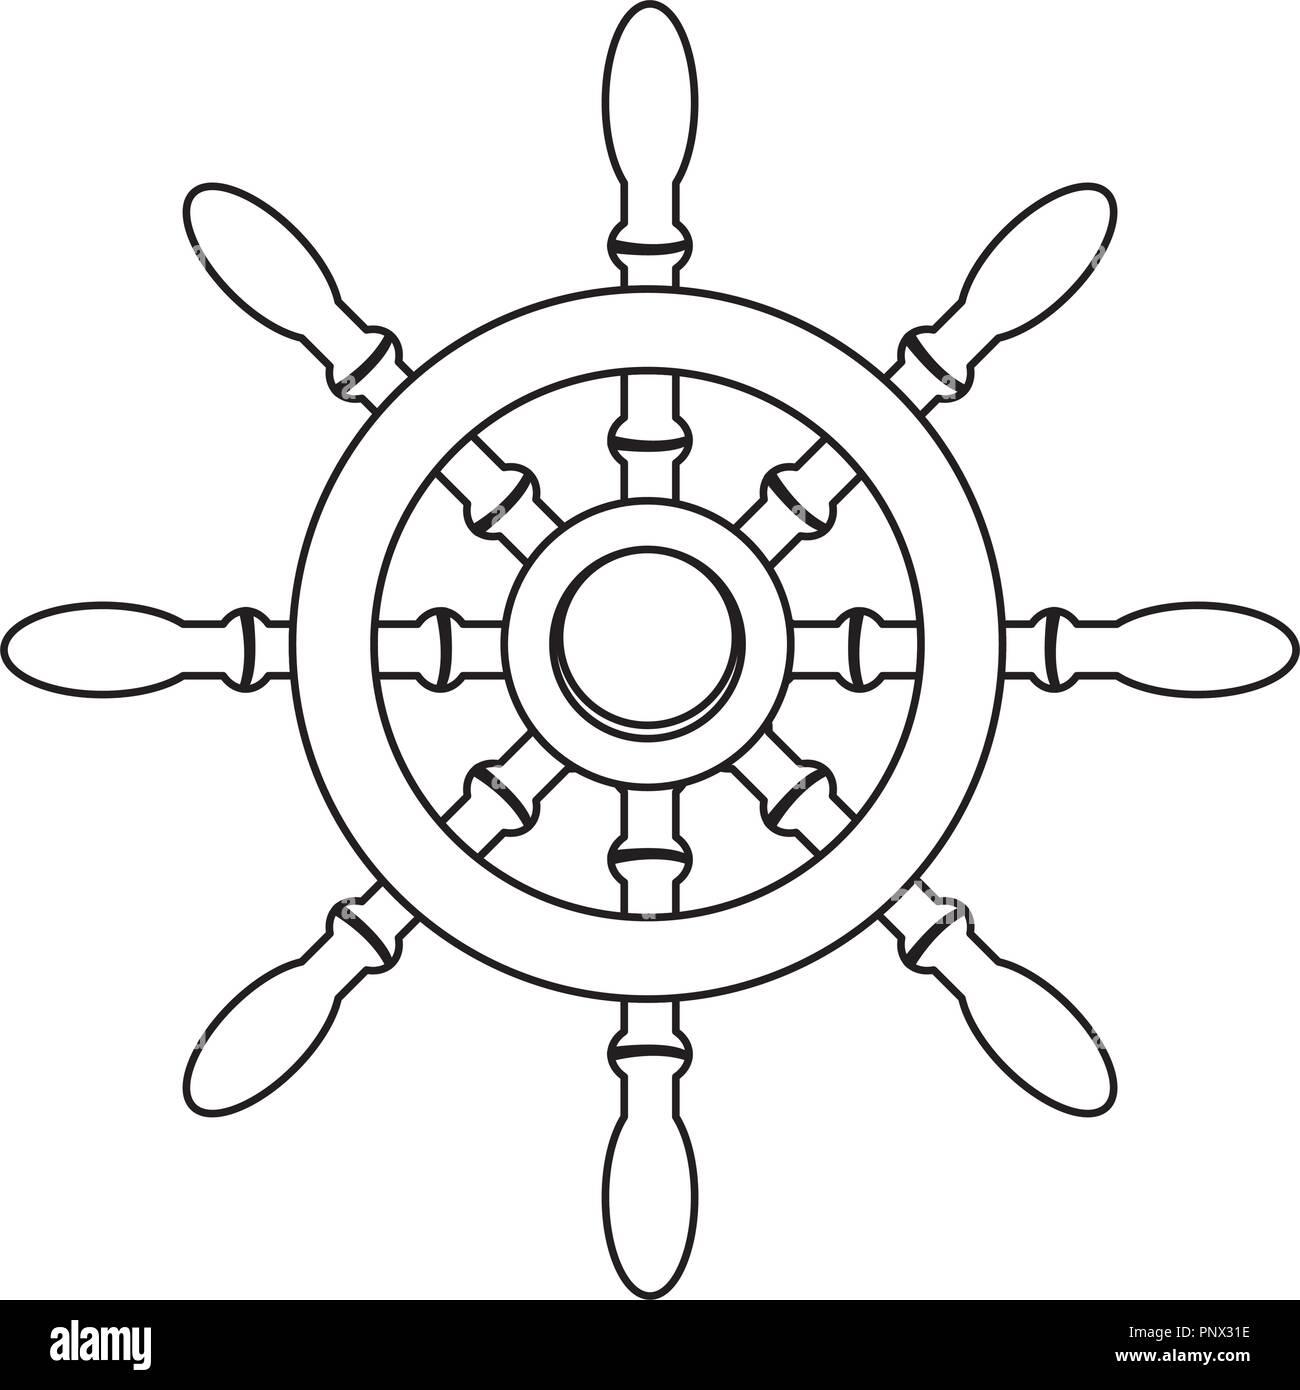 outline rudder ship object to marine navigation Stock Vector